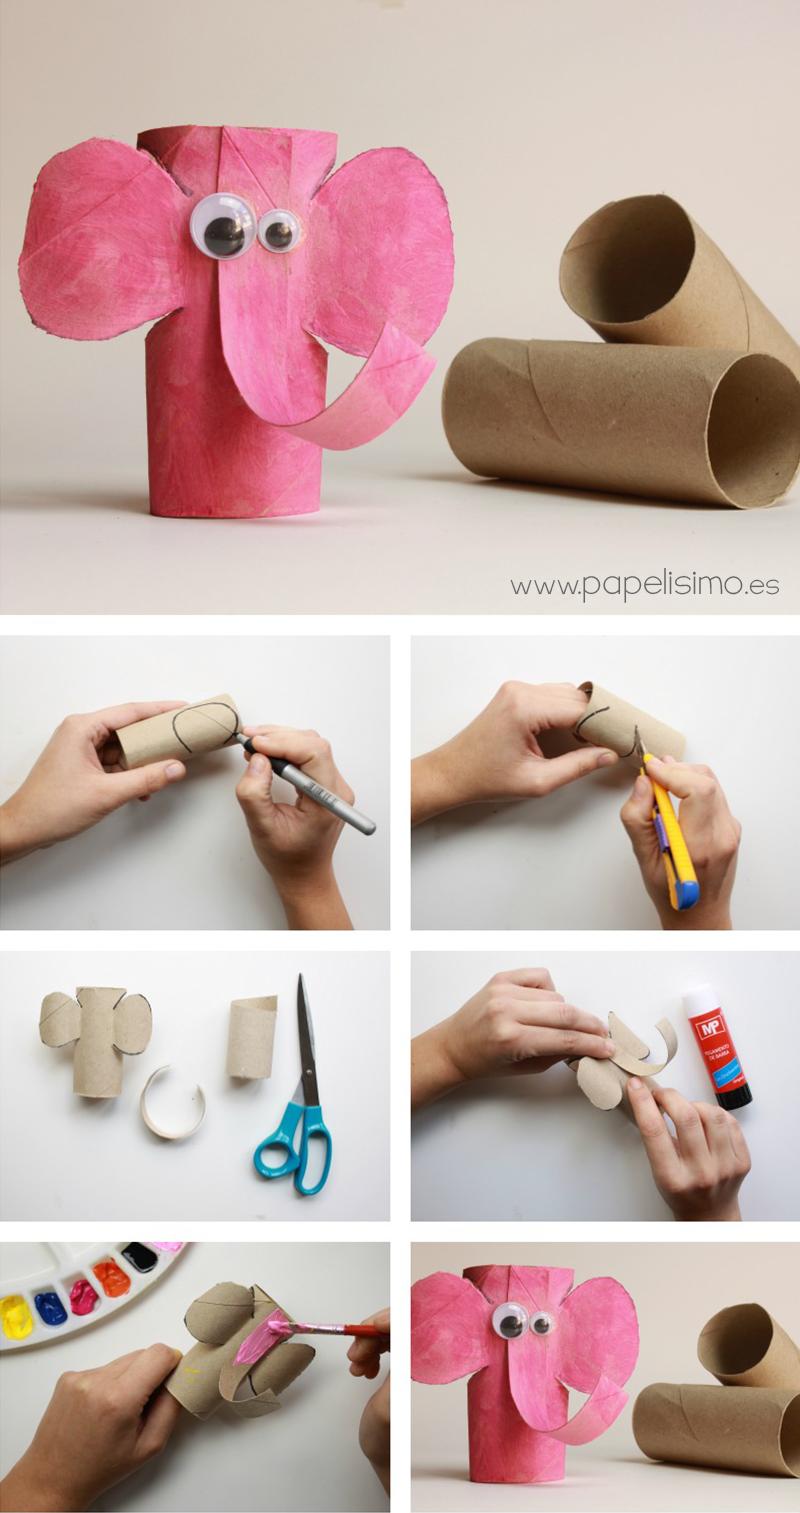 animales-rollos-papel-higienico-8